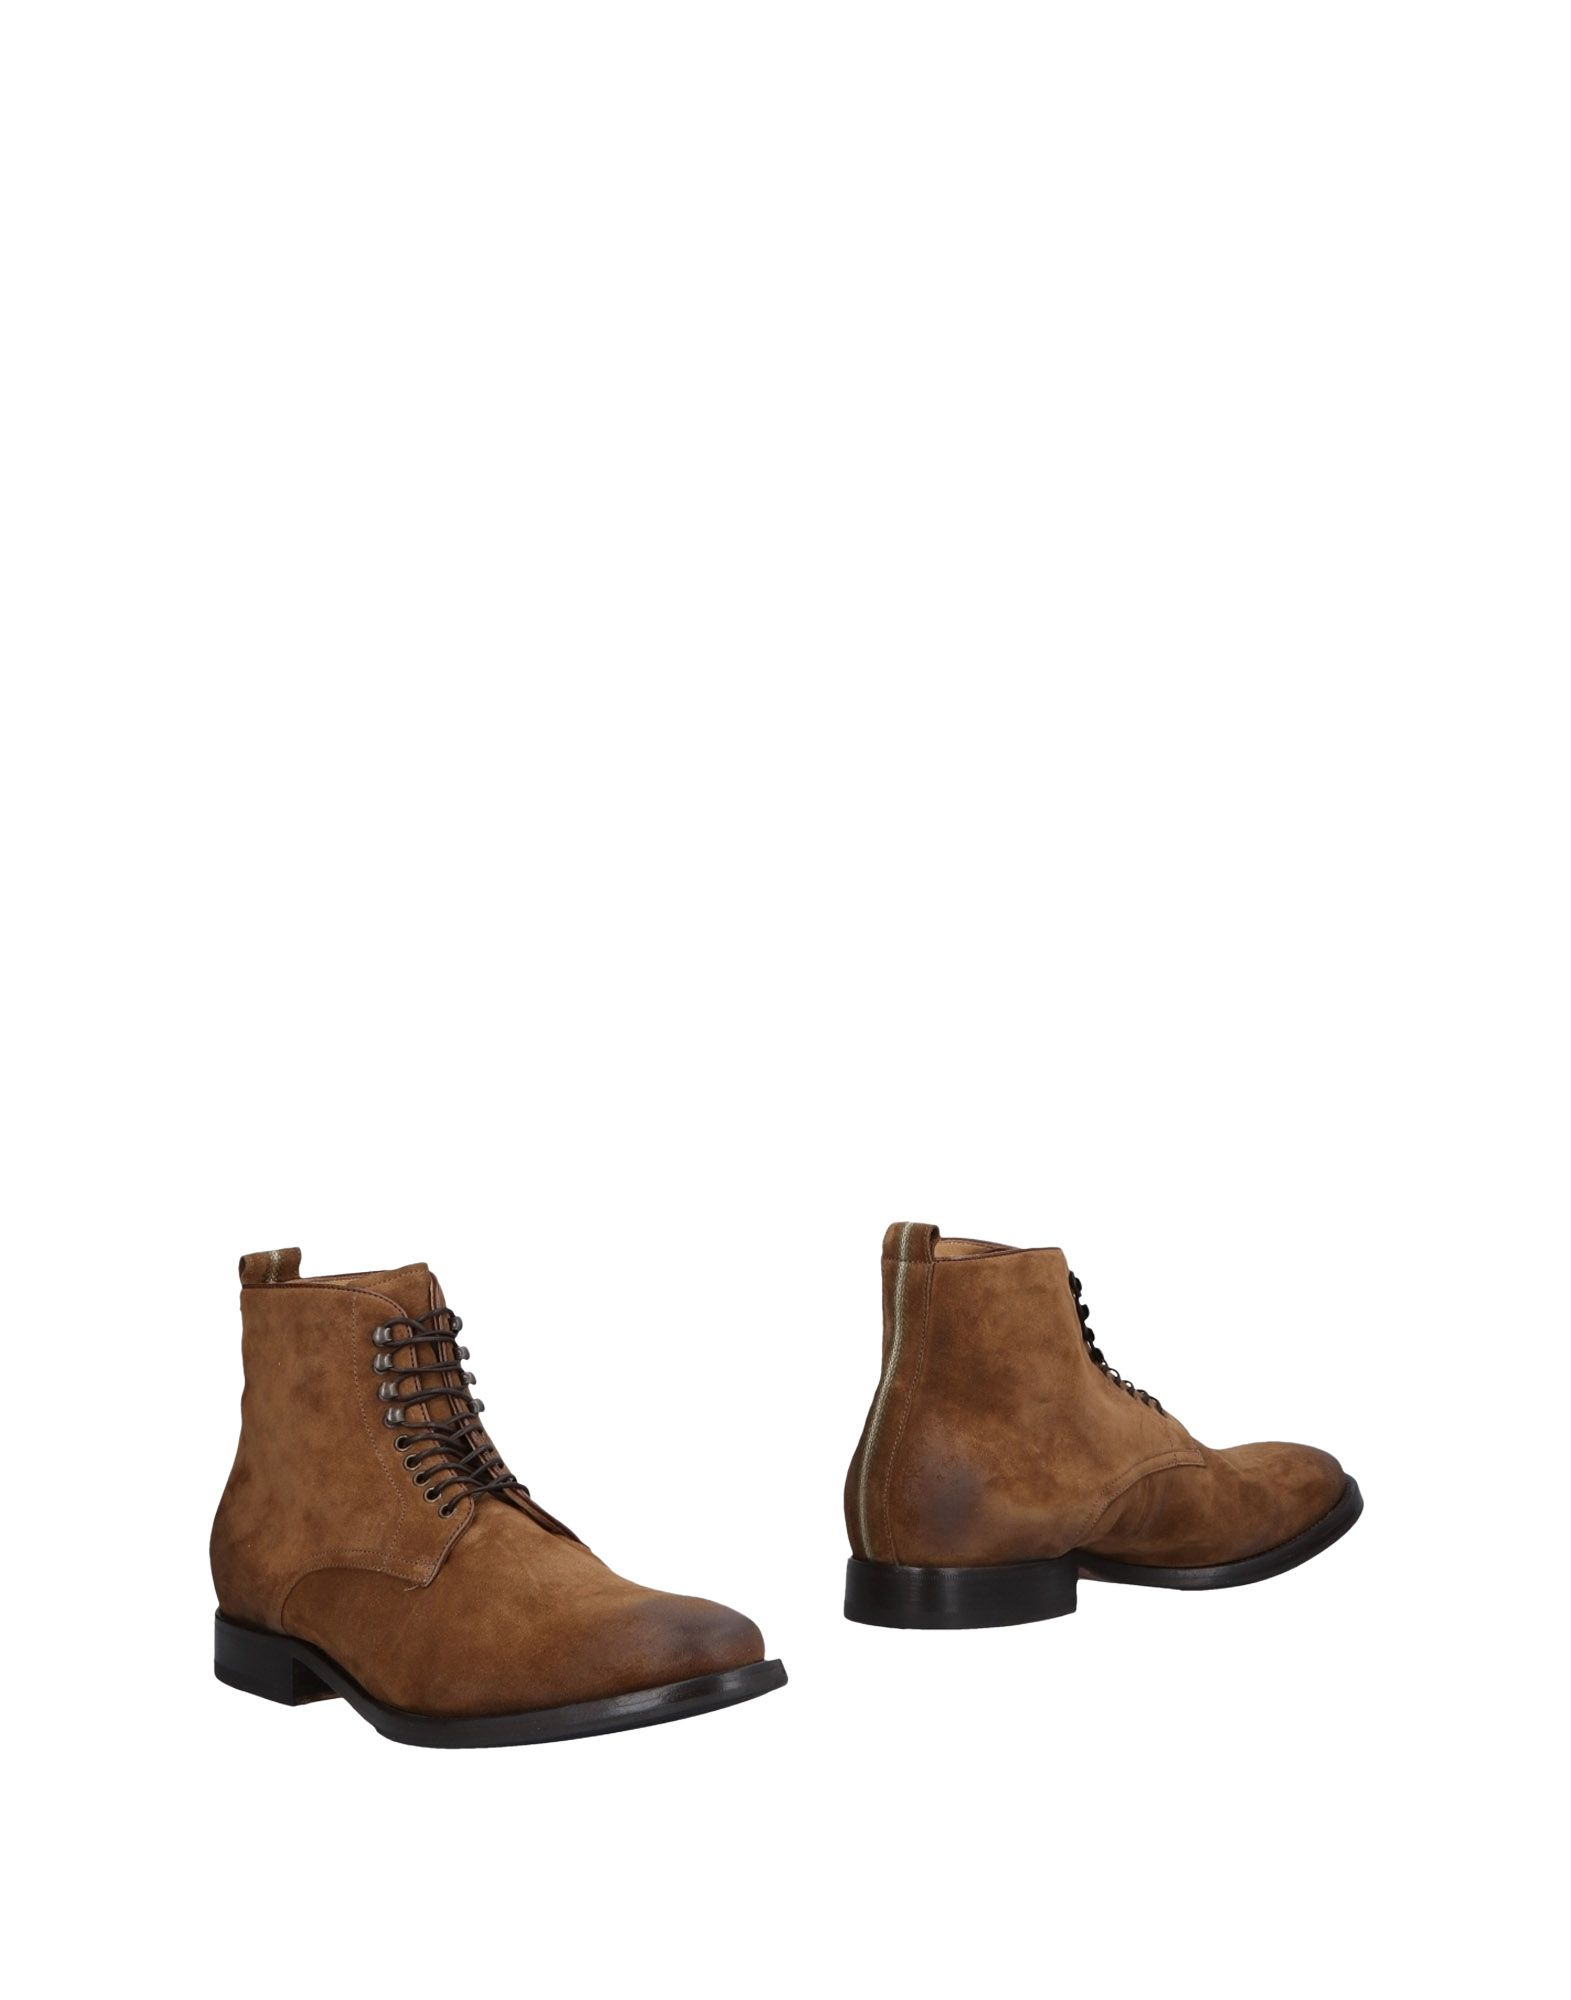 sartori or bottes - en hommes sartori or bottes en - ligne sur l'australie - 11472844sd 15cdee